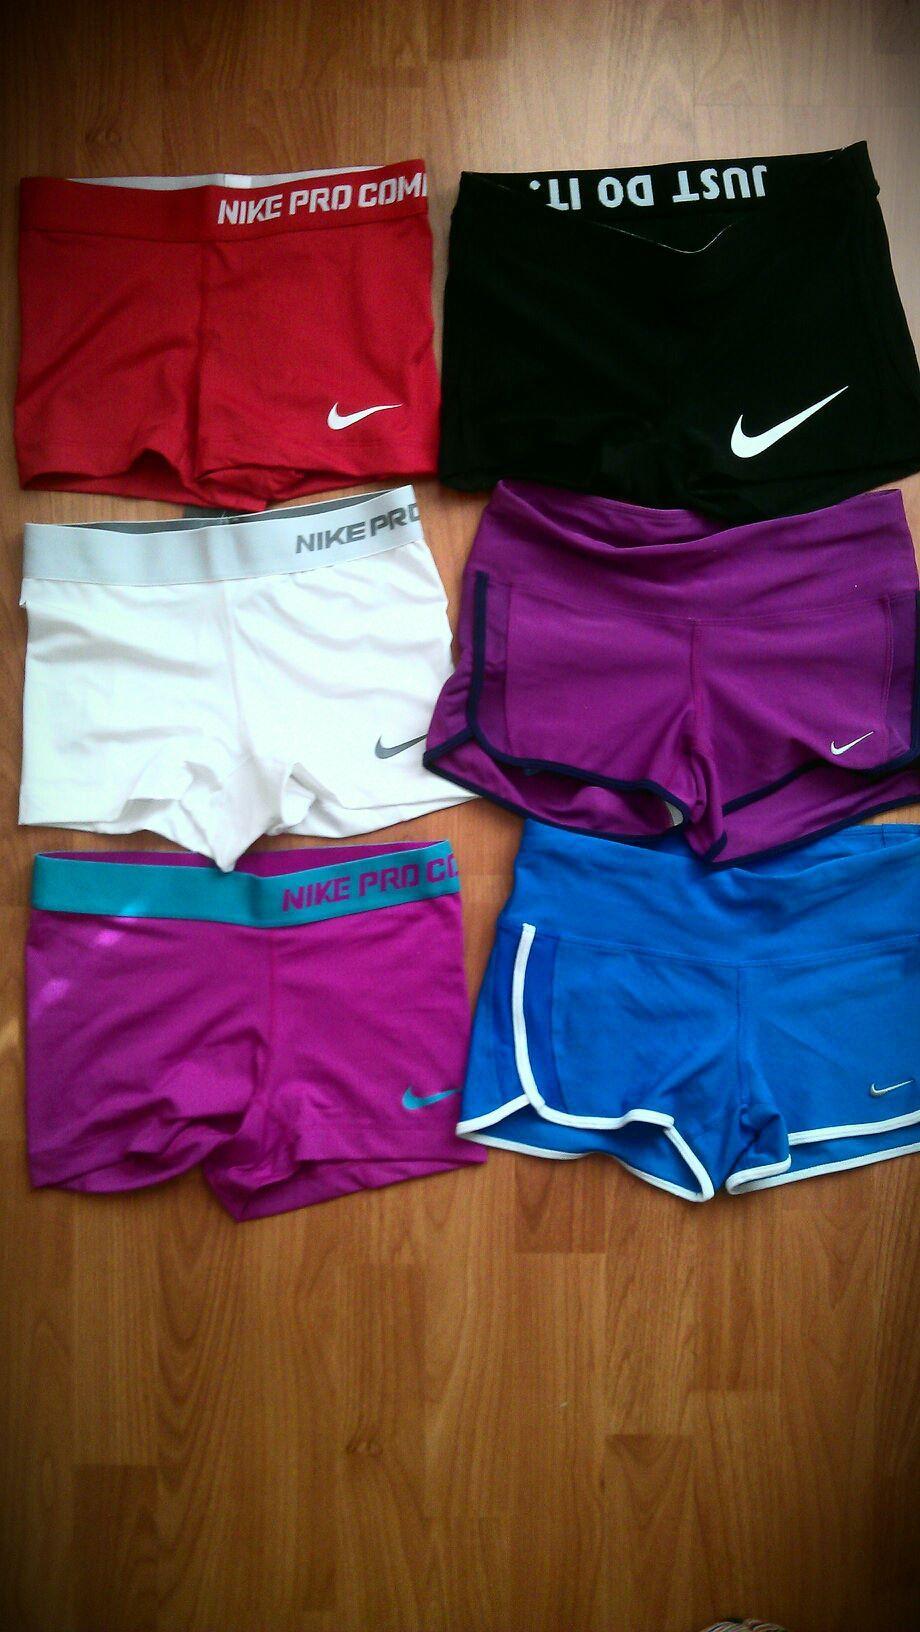 i'm addicted to these nike pro core compression shorts!! i